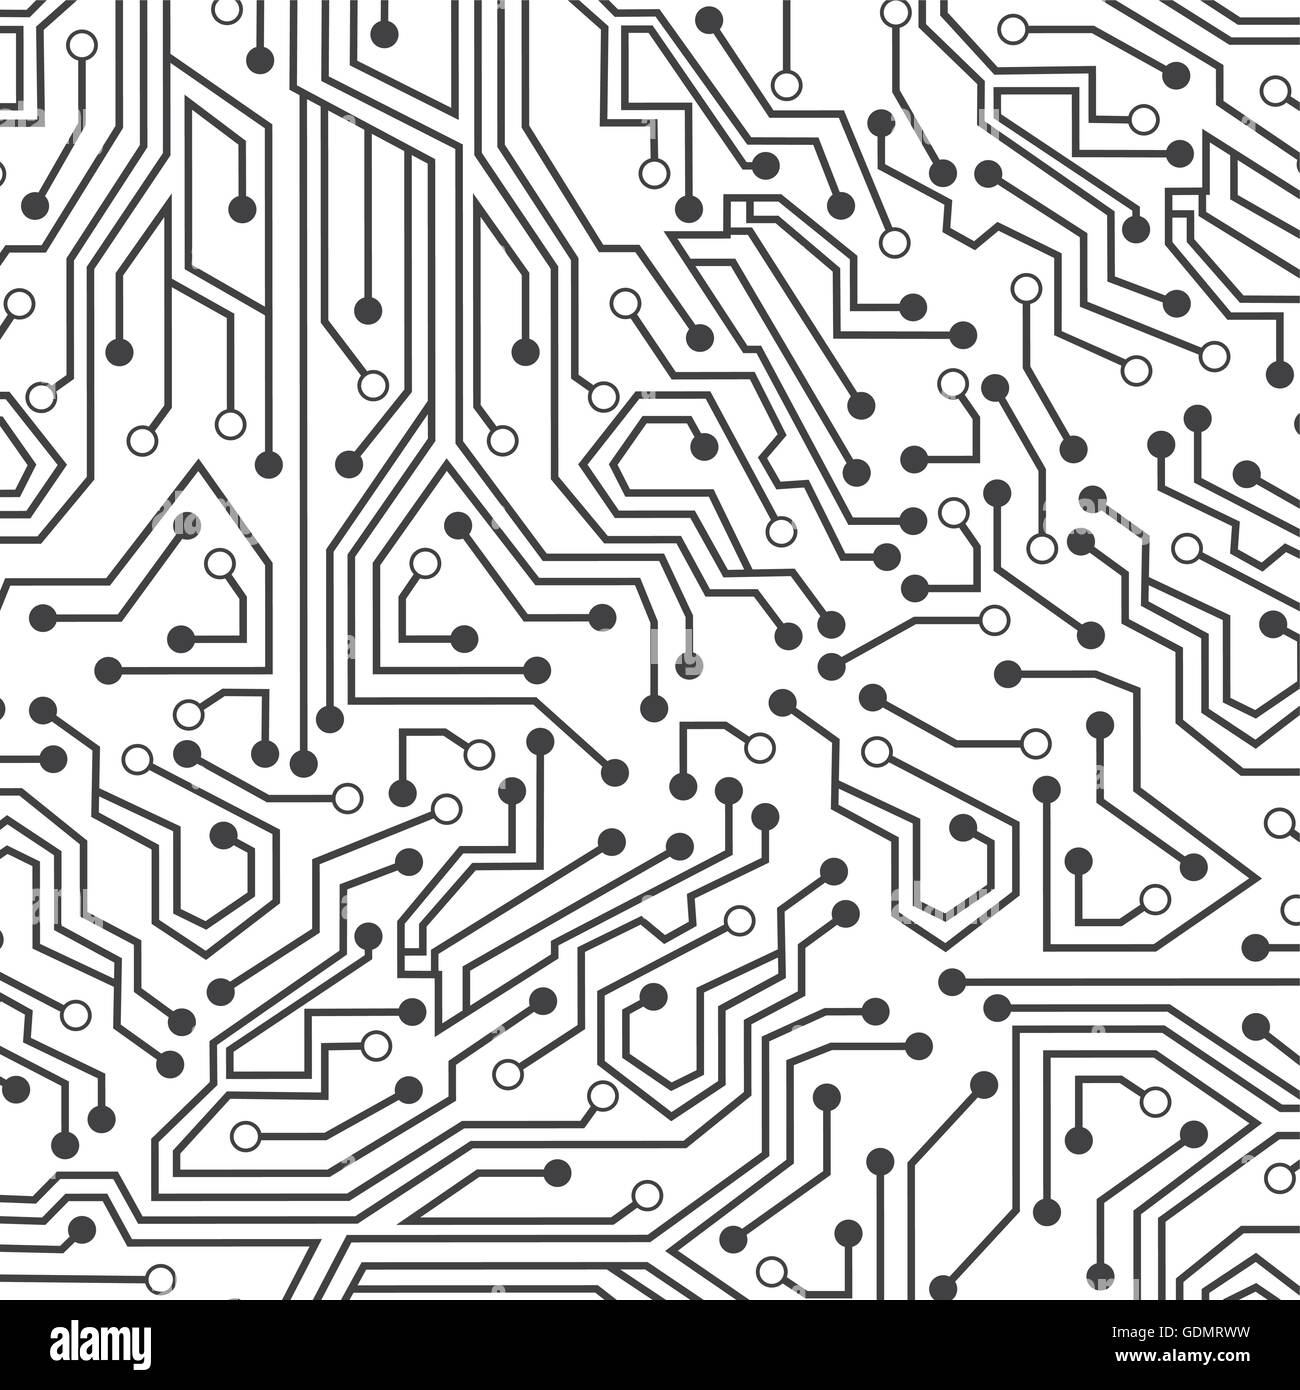 Circuit Electric Wallpaper Icon Stock Vector Art